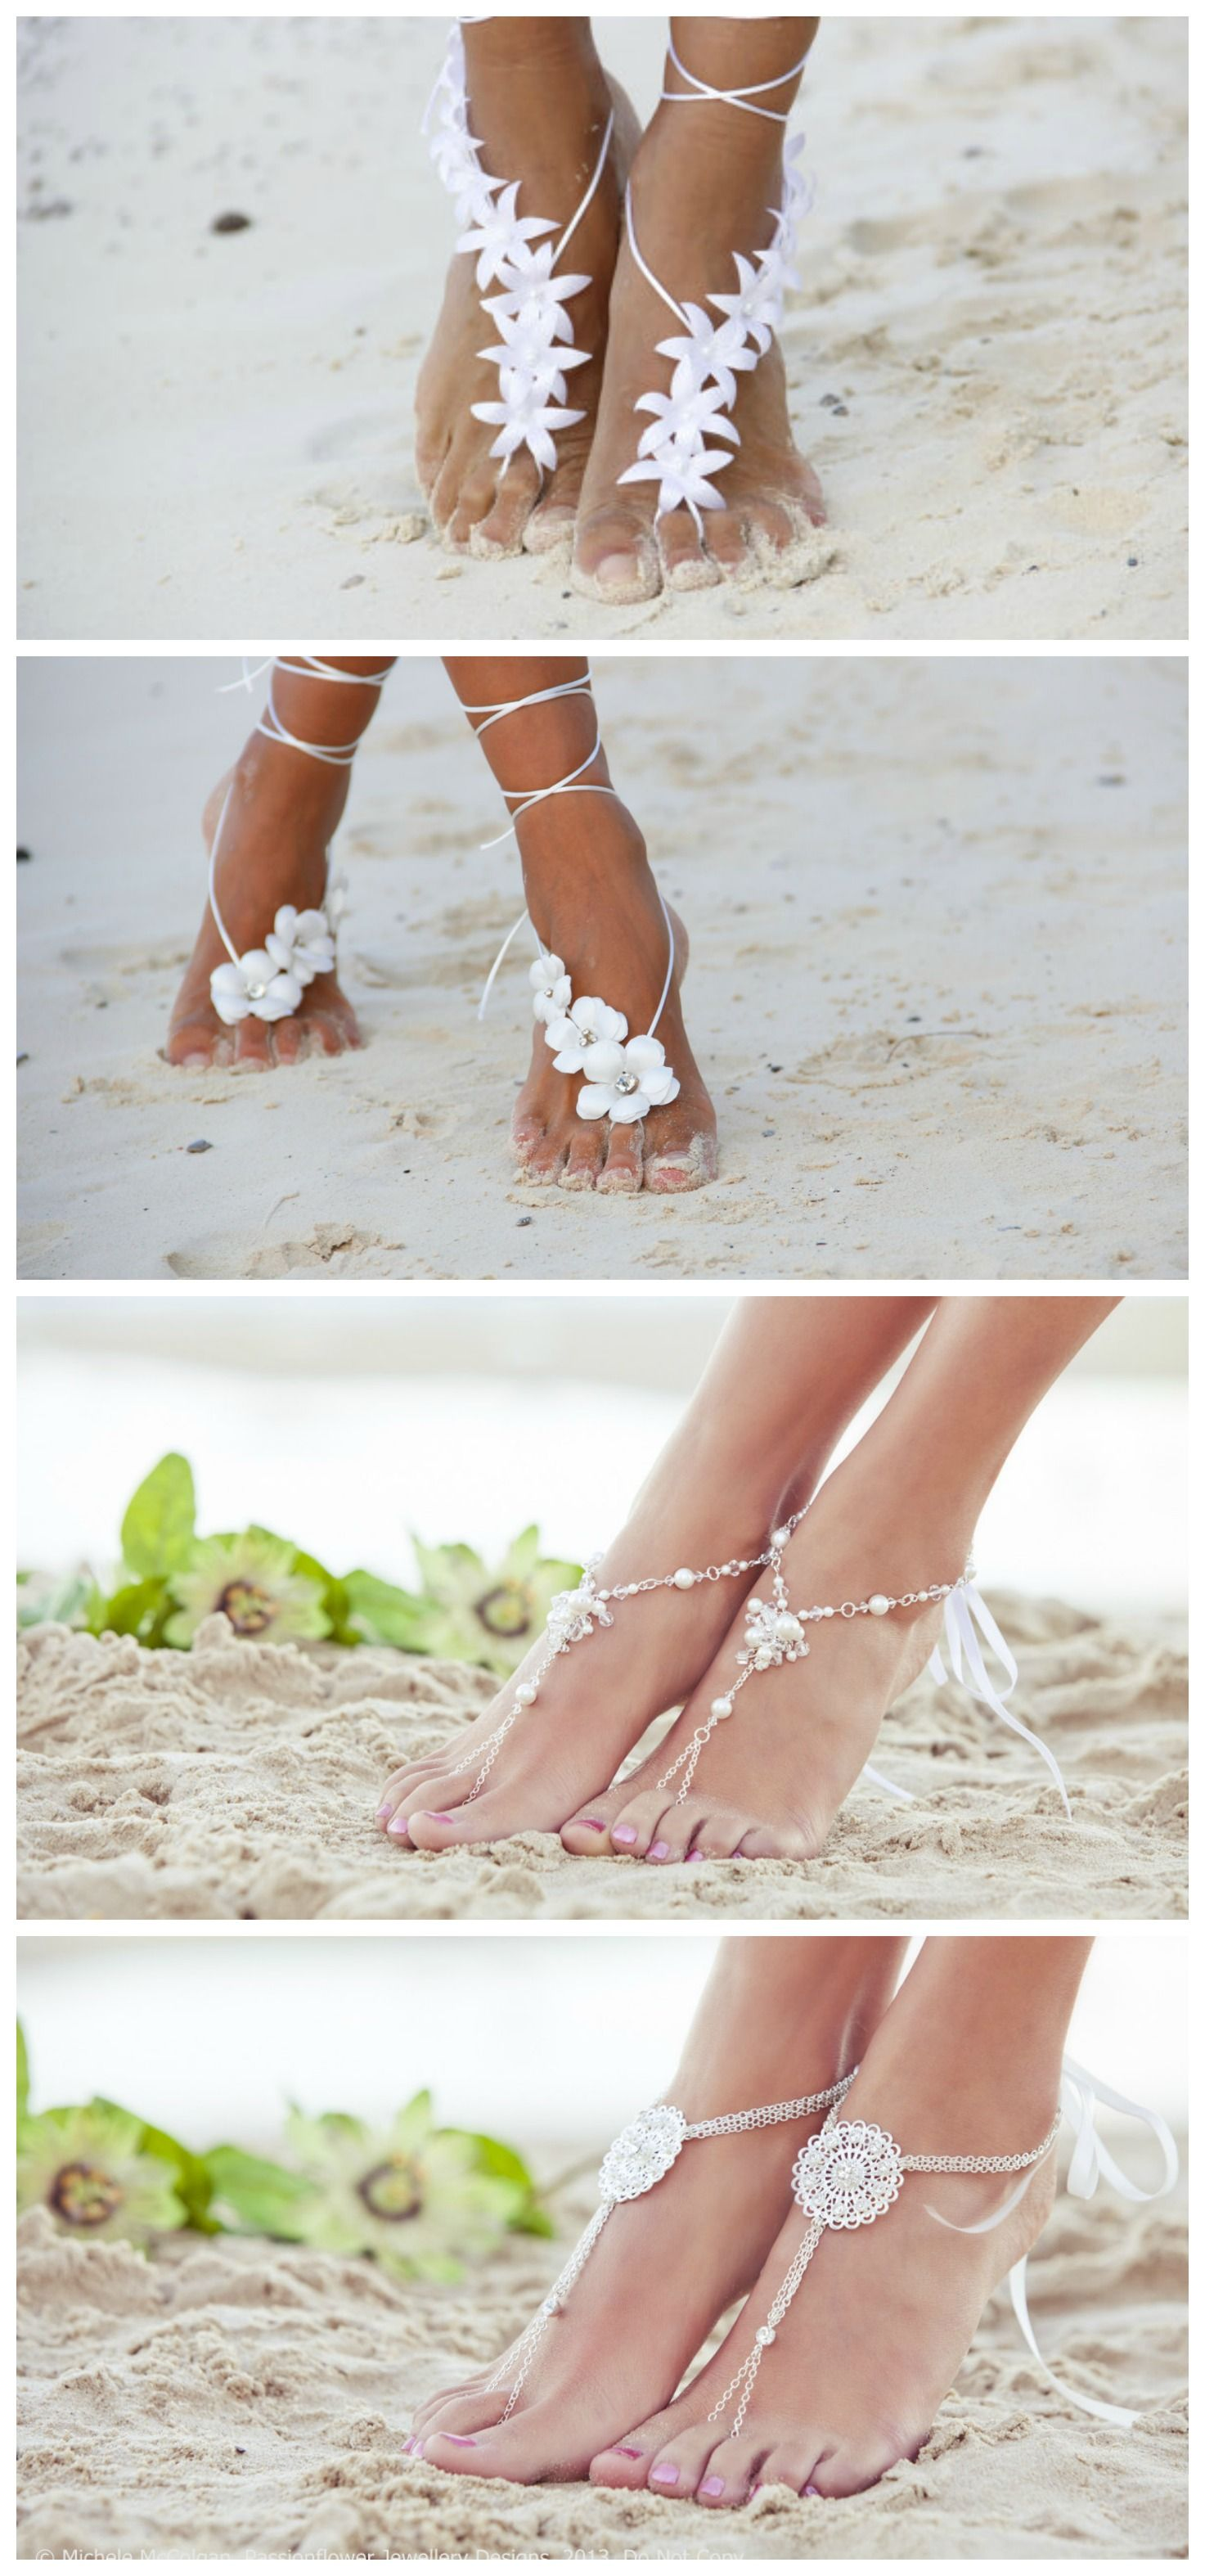 Wedding shoes heels vs flats beach shoes beach and wedding